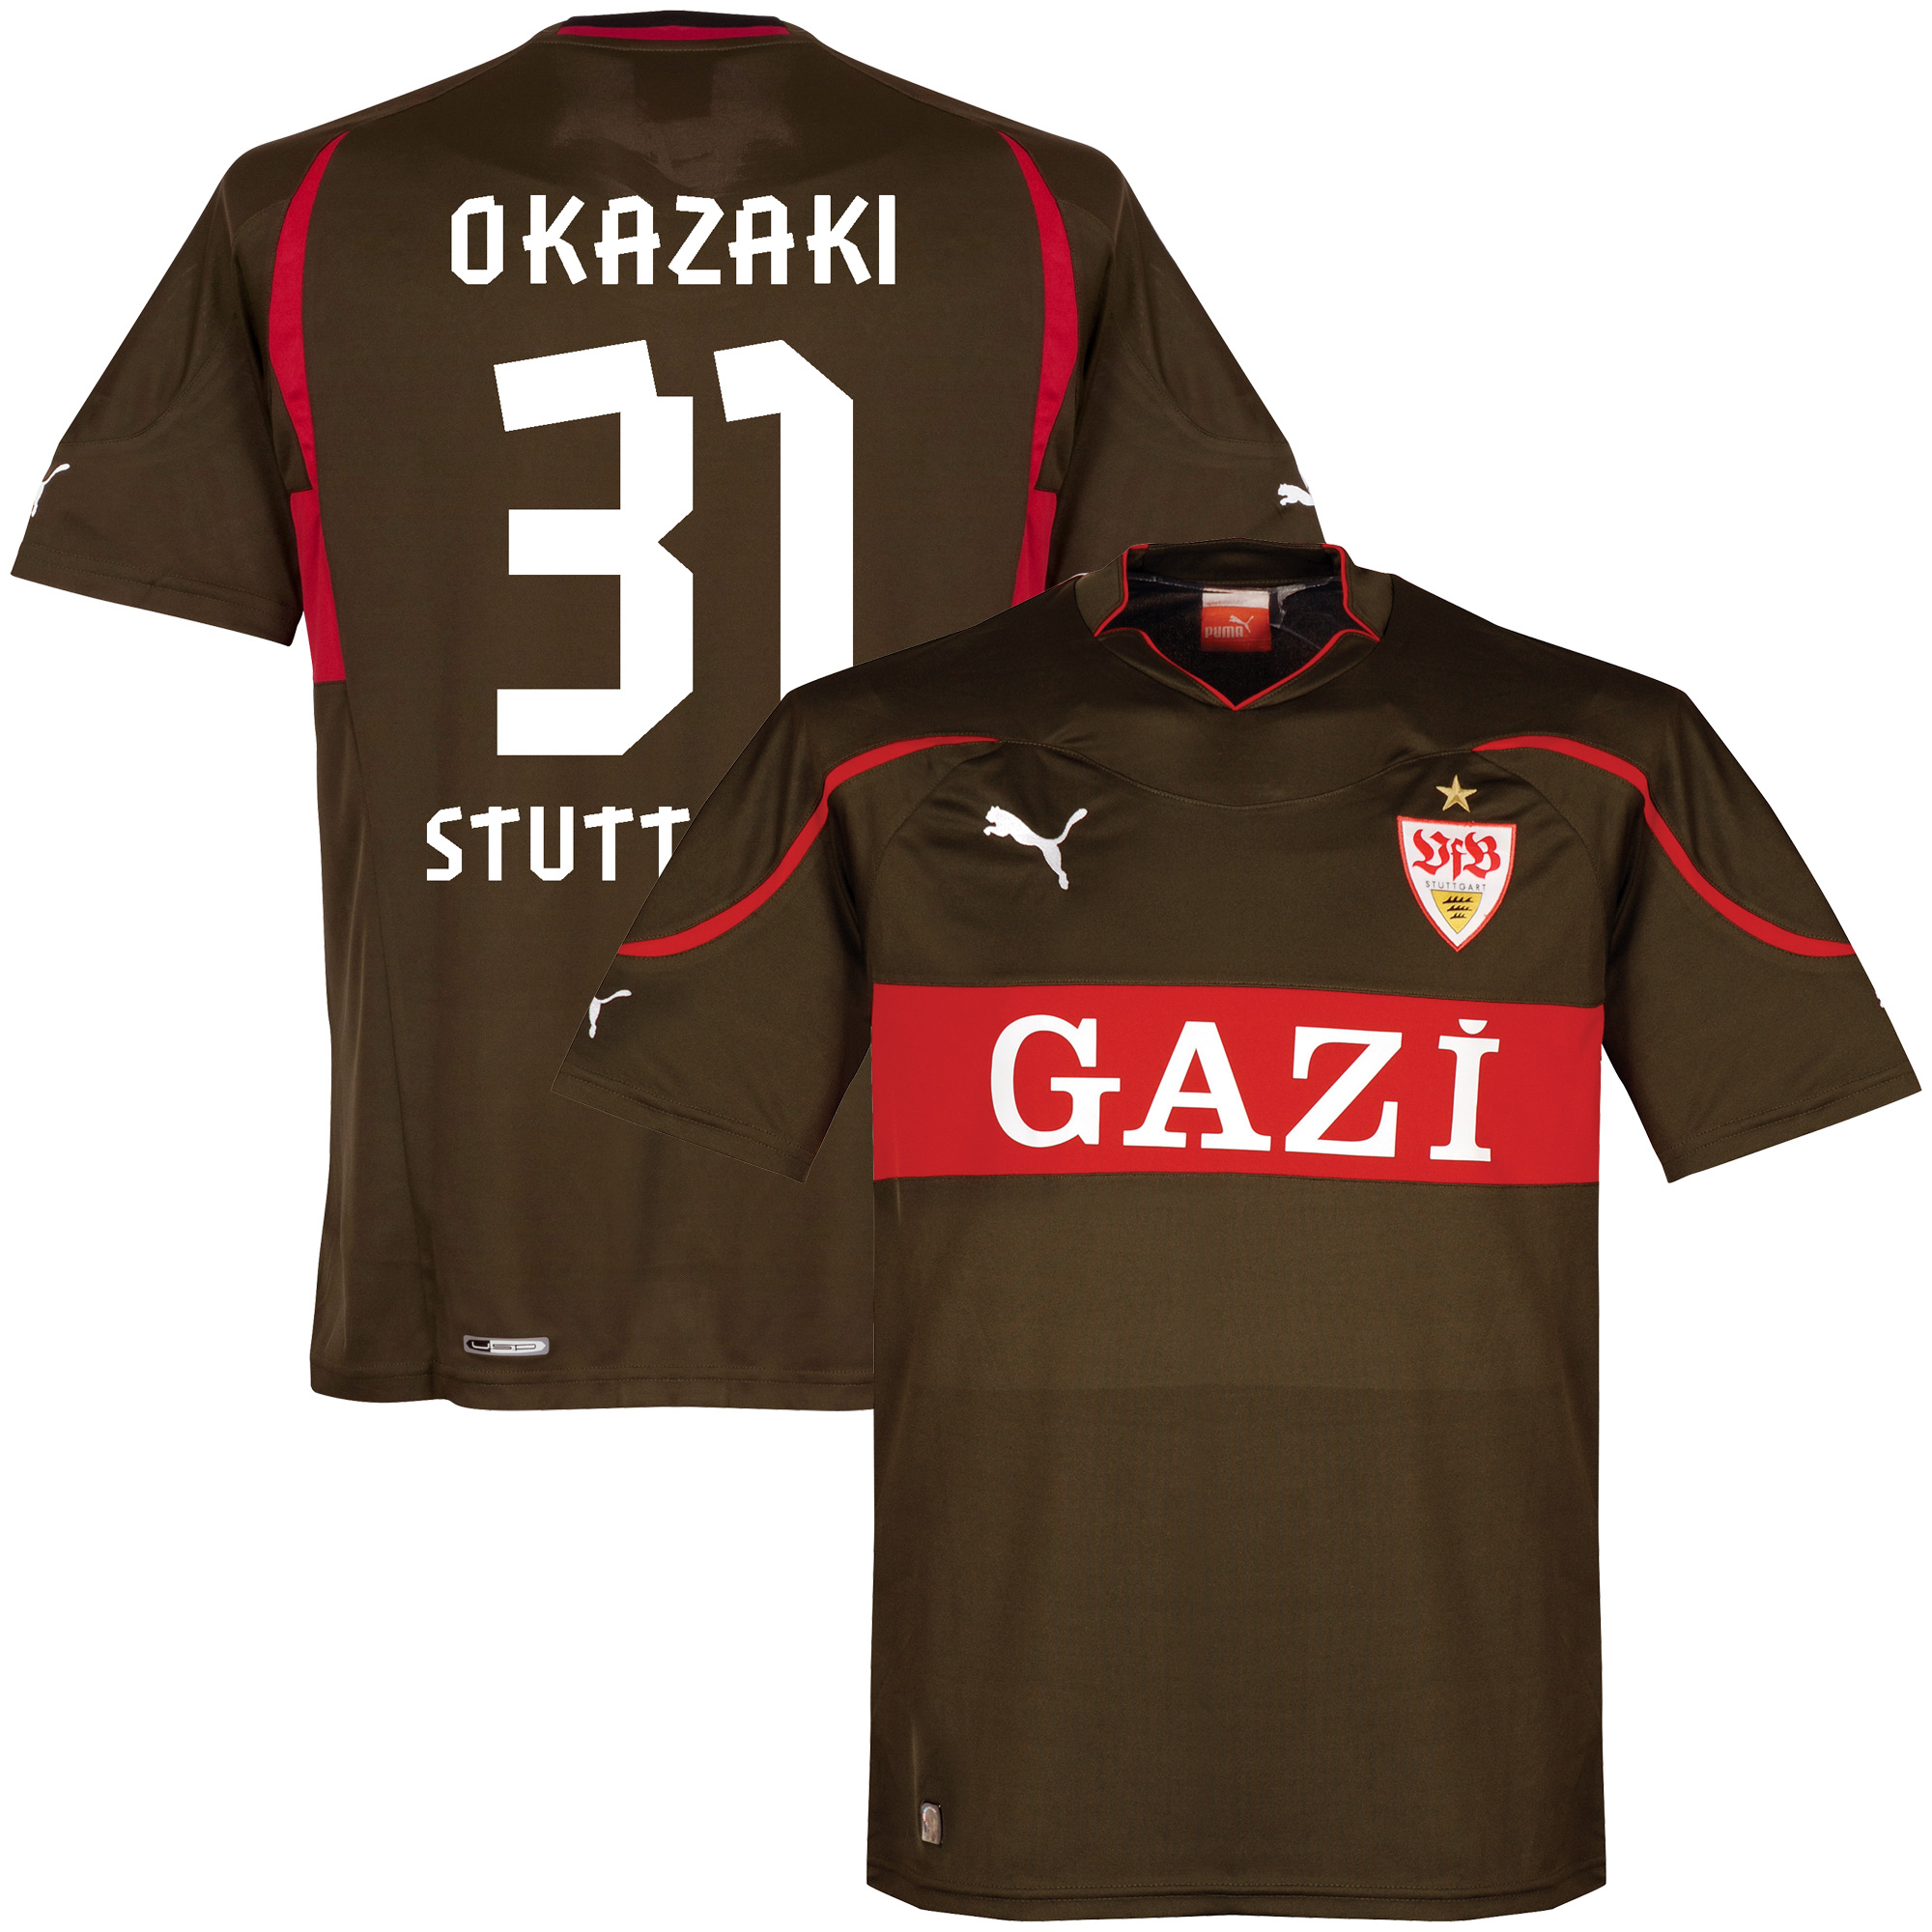 10-11 VfB Stuttgart 3rd Okazaki Jersey (Fan Style Printing) - XXL